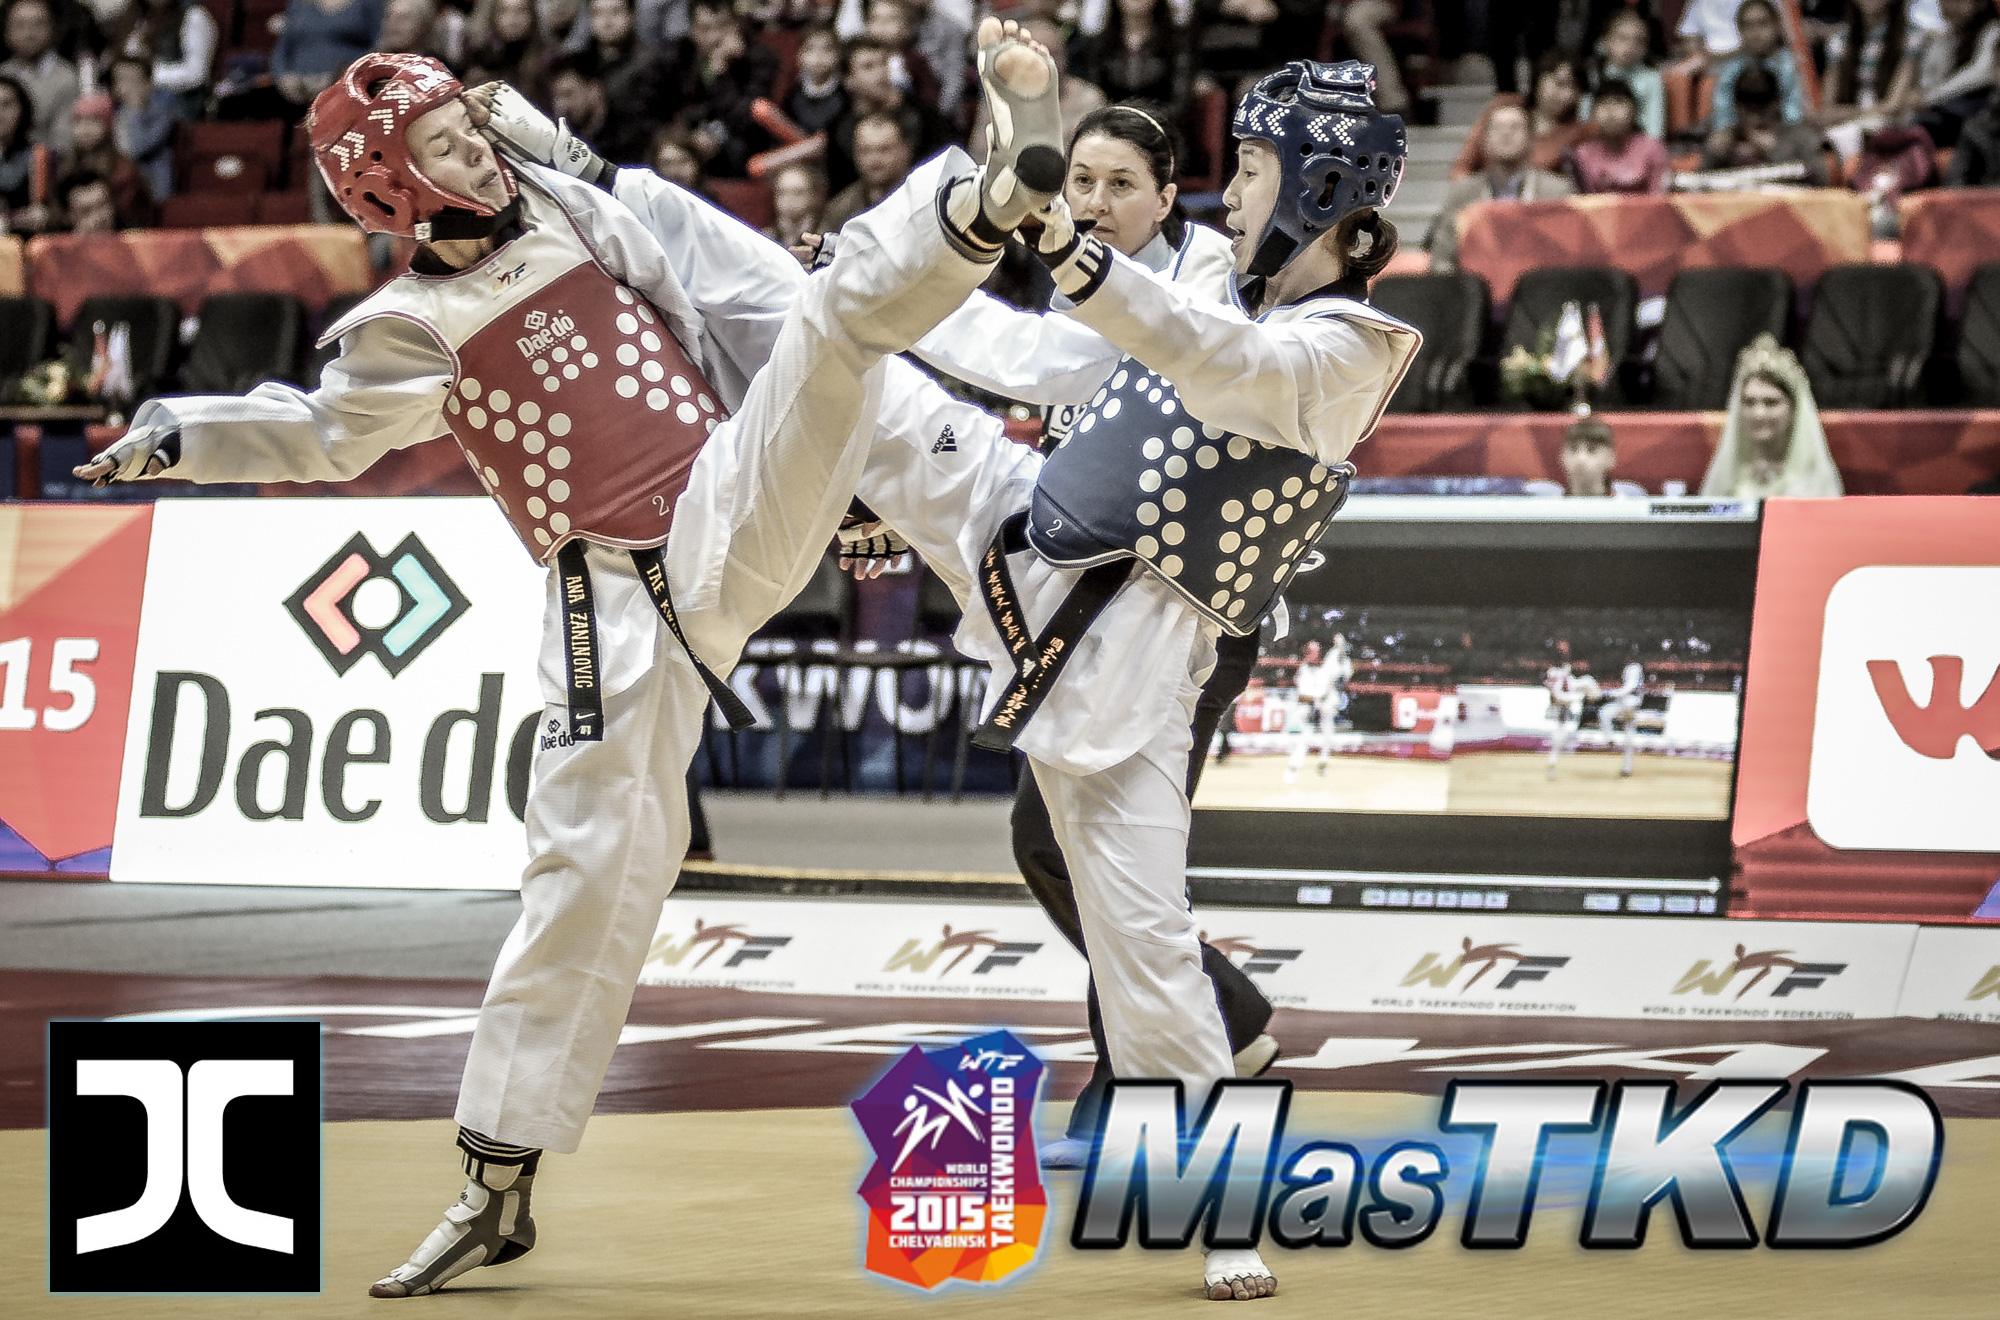 07_JCalicu-Mejores-imagenes-del-Mundial-de-Taekwondo_d5